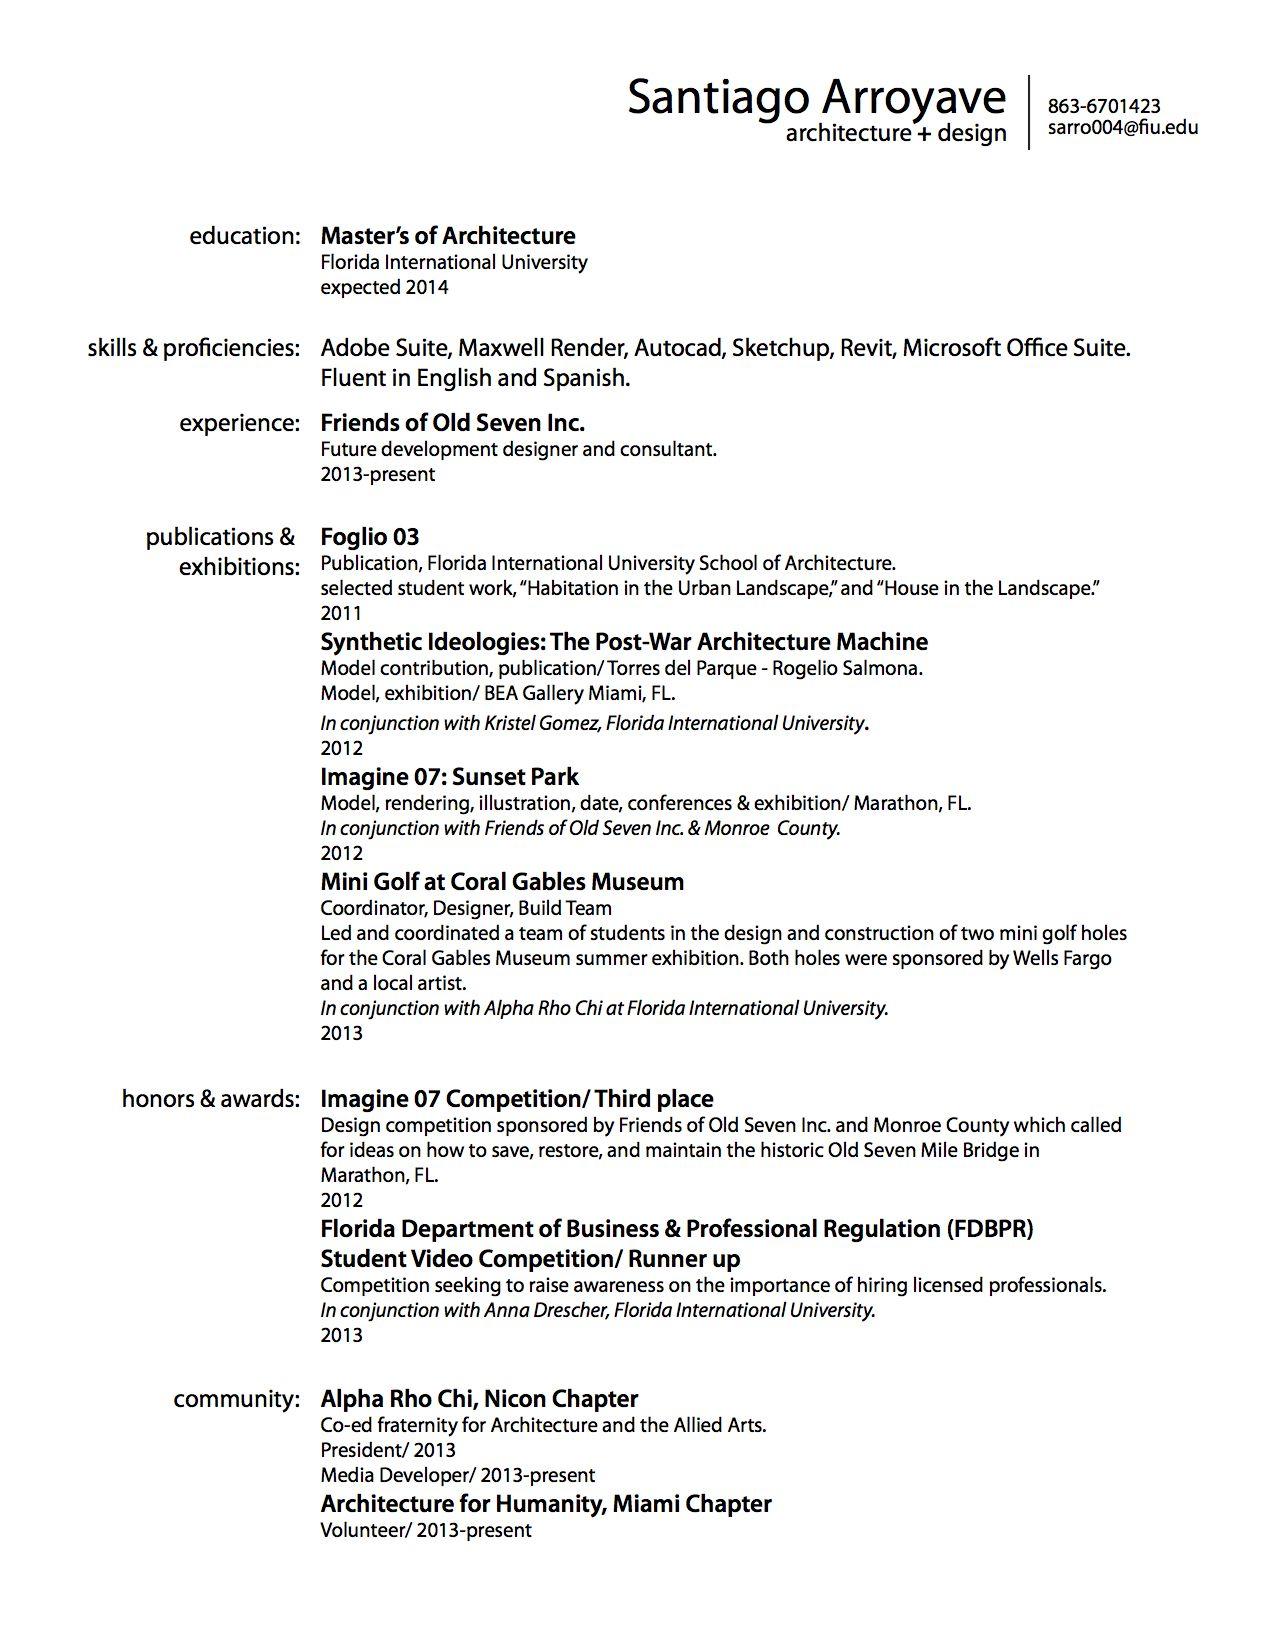 Fall 2013 Curriculum Vitae